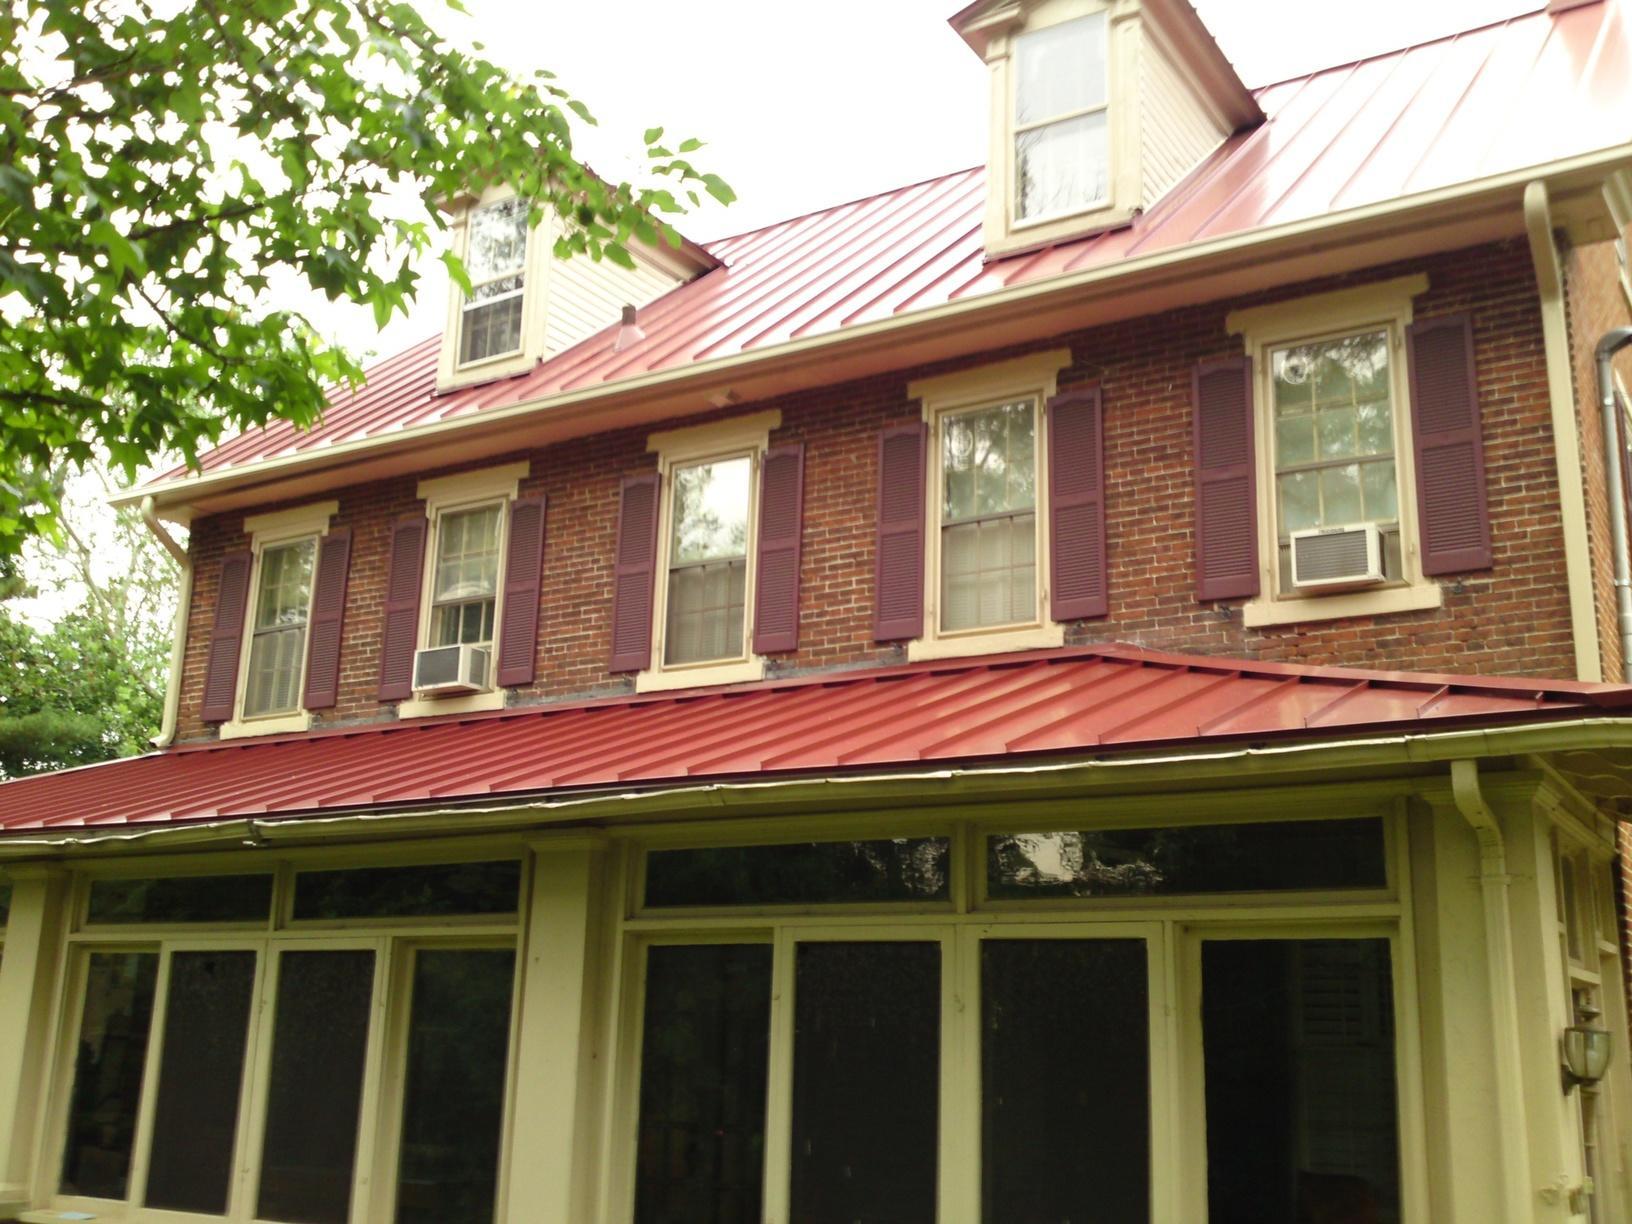 Metal Roofing on Historic Cinnaminson, NJ Home